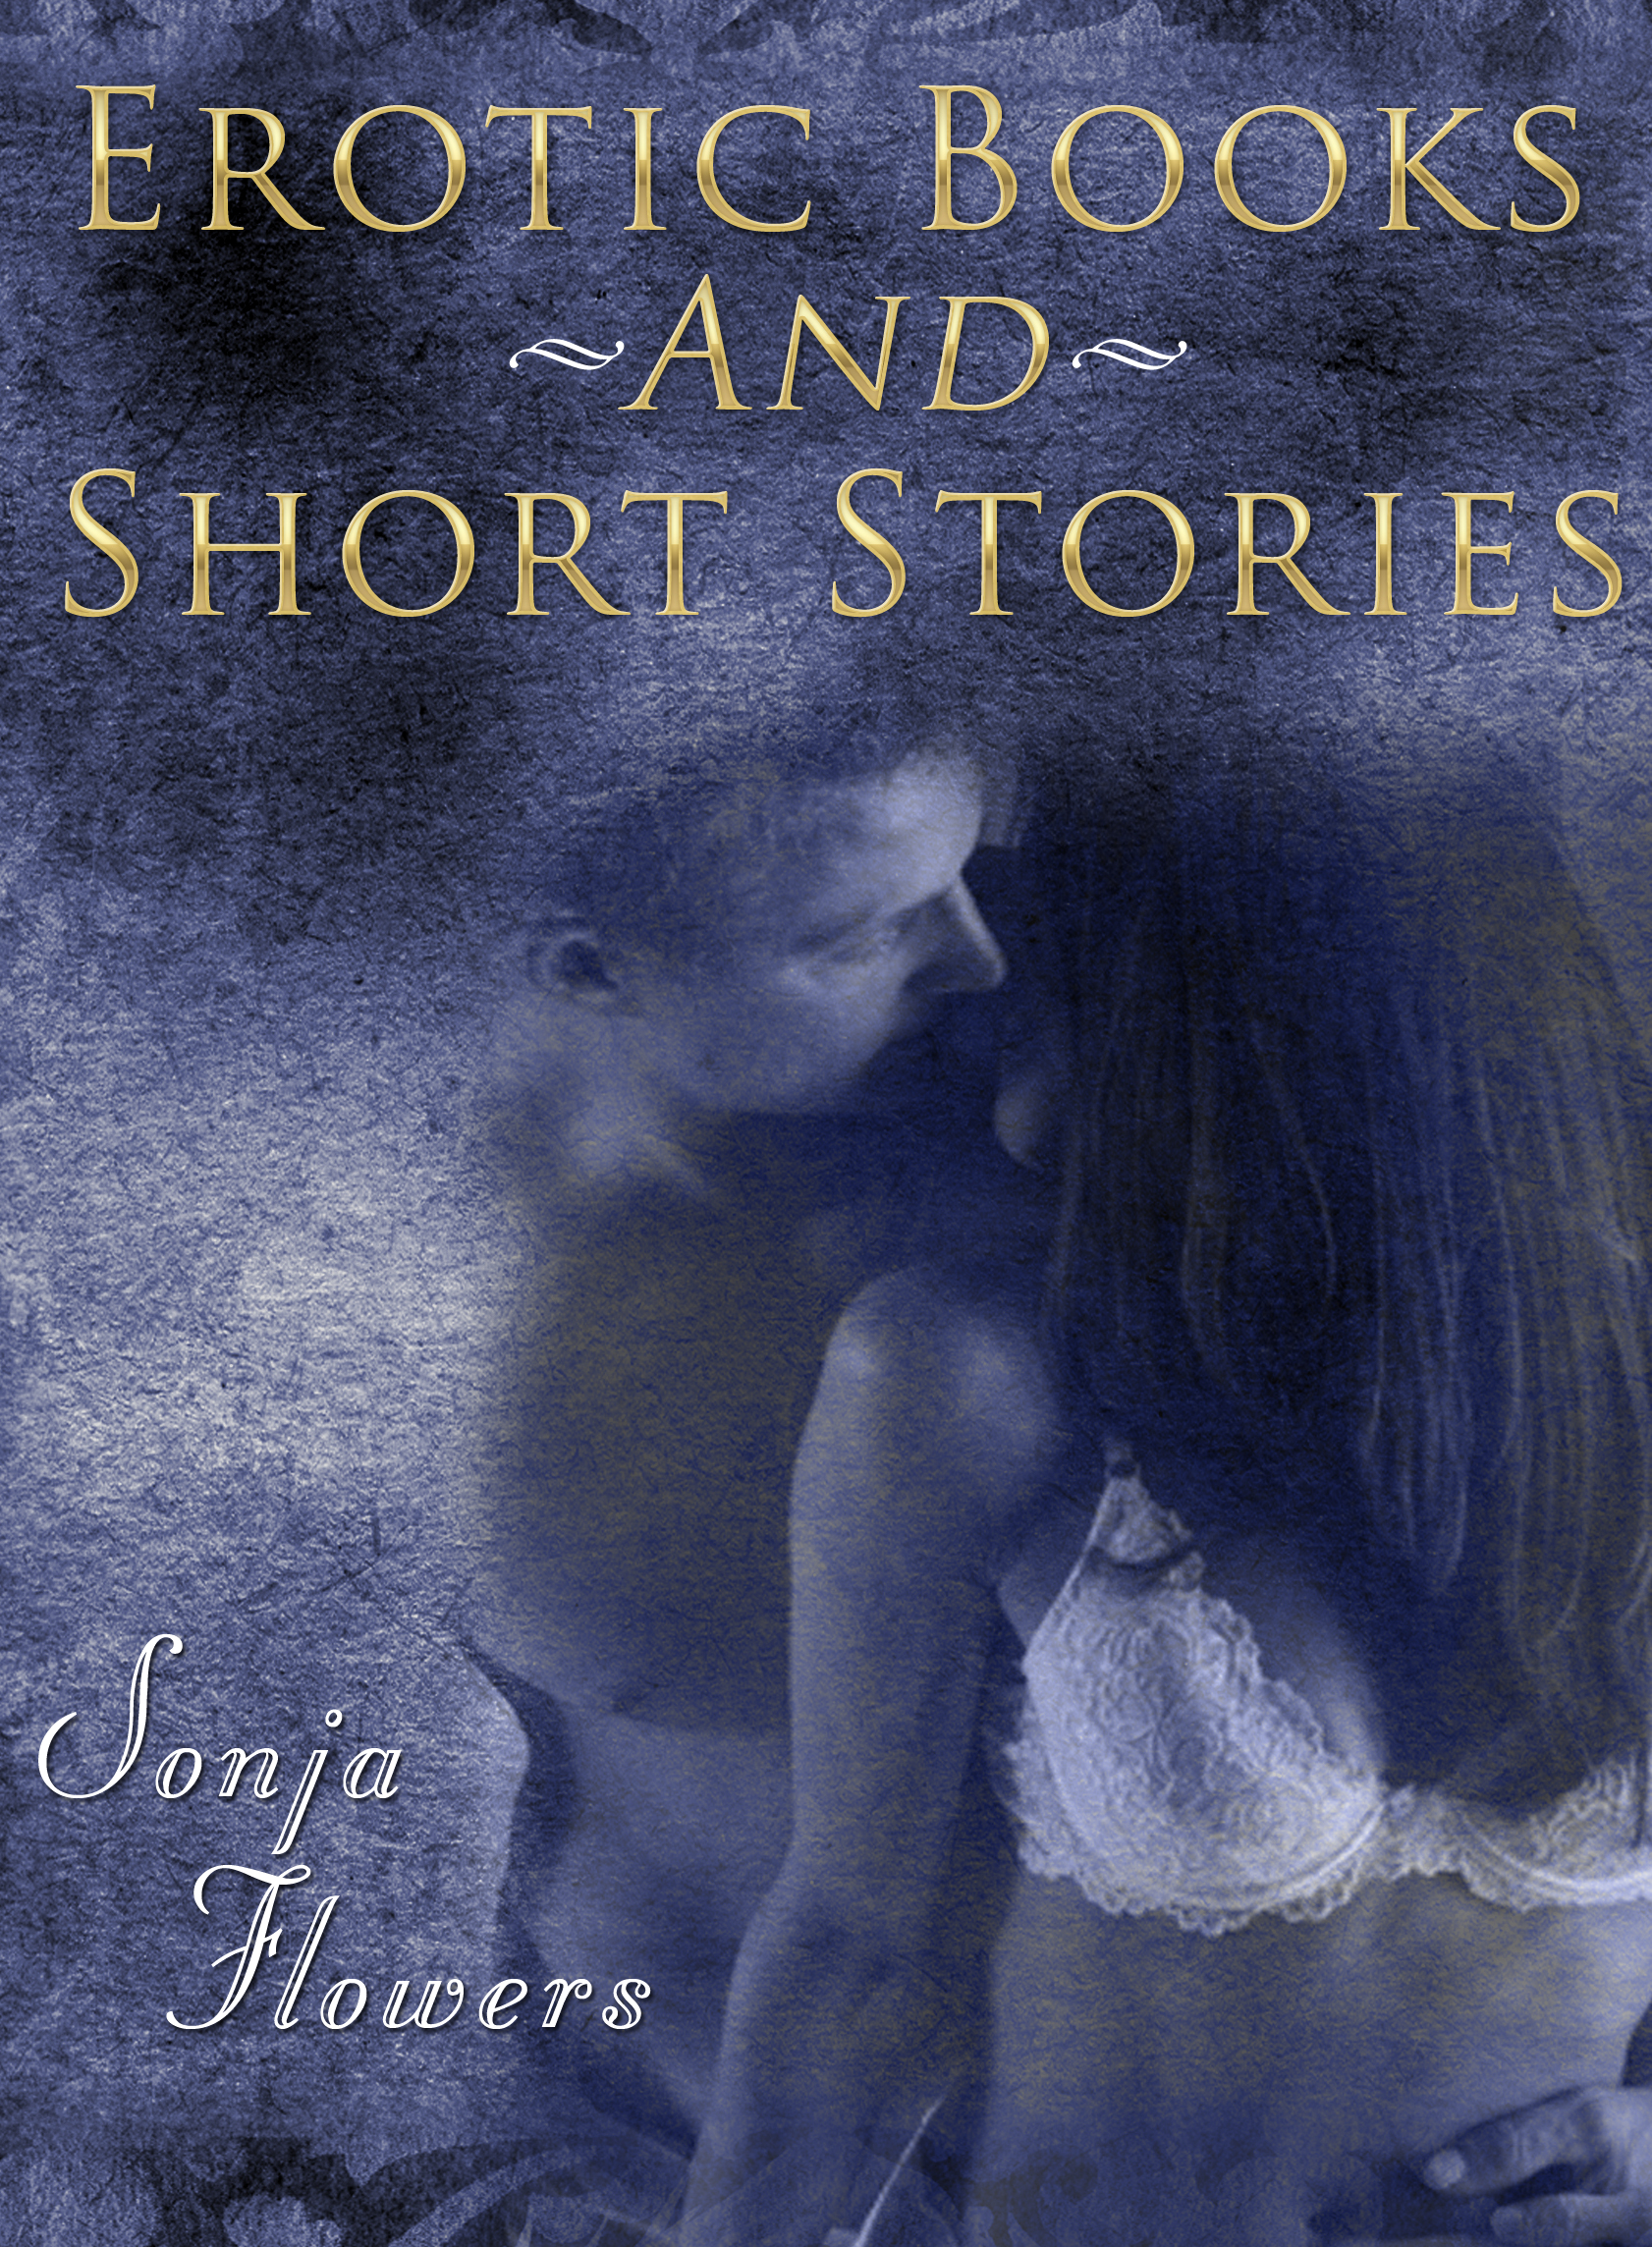 Interesting erotic stories